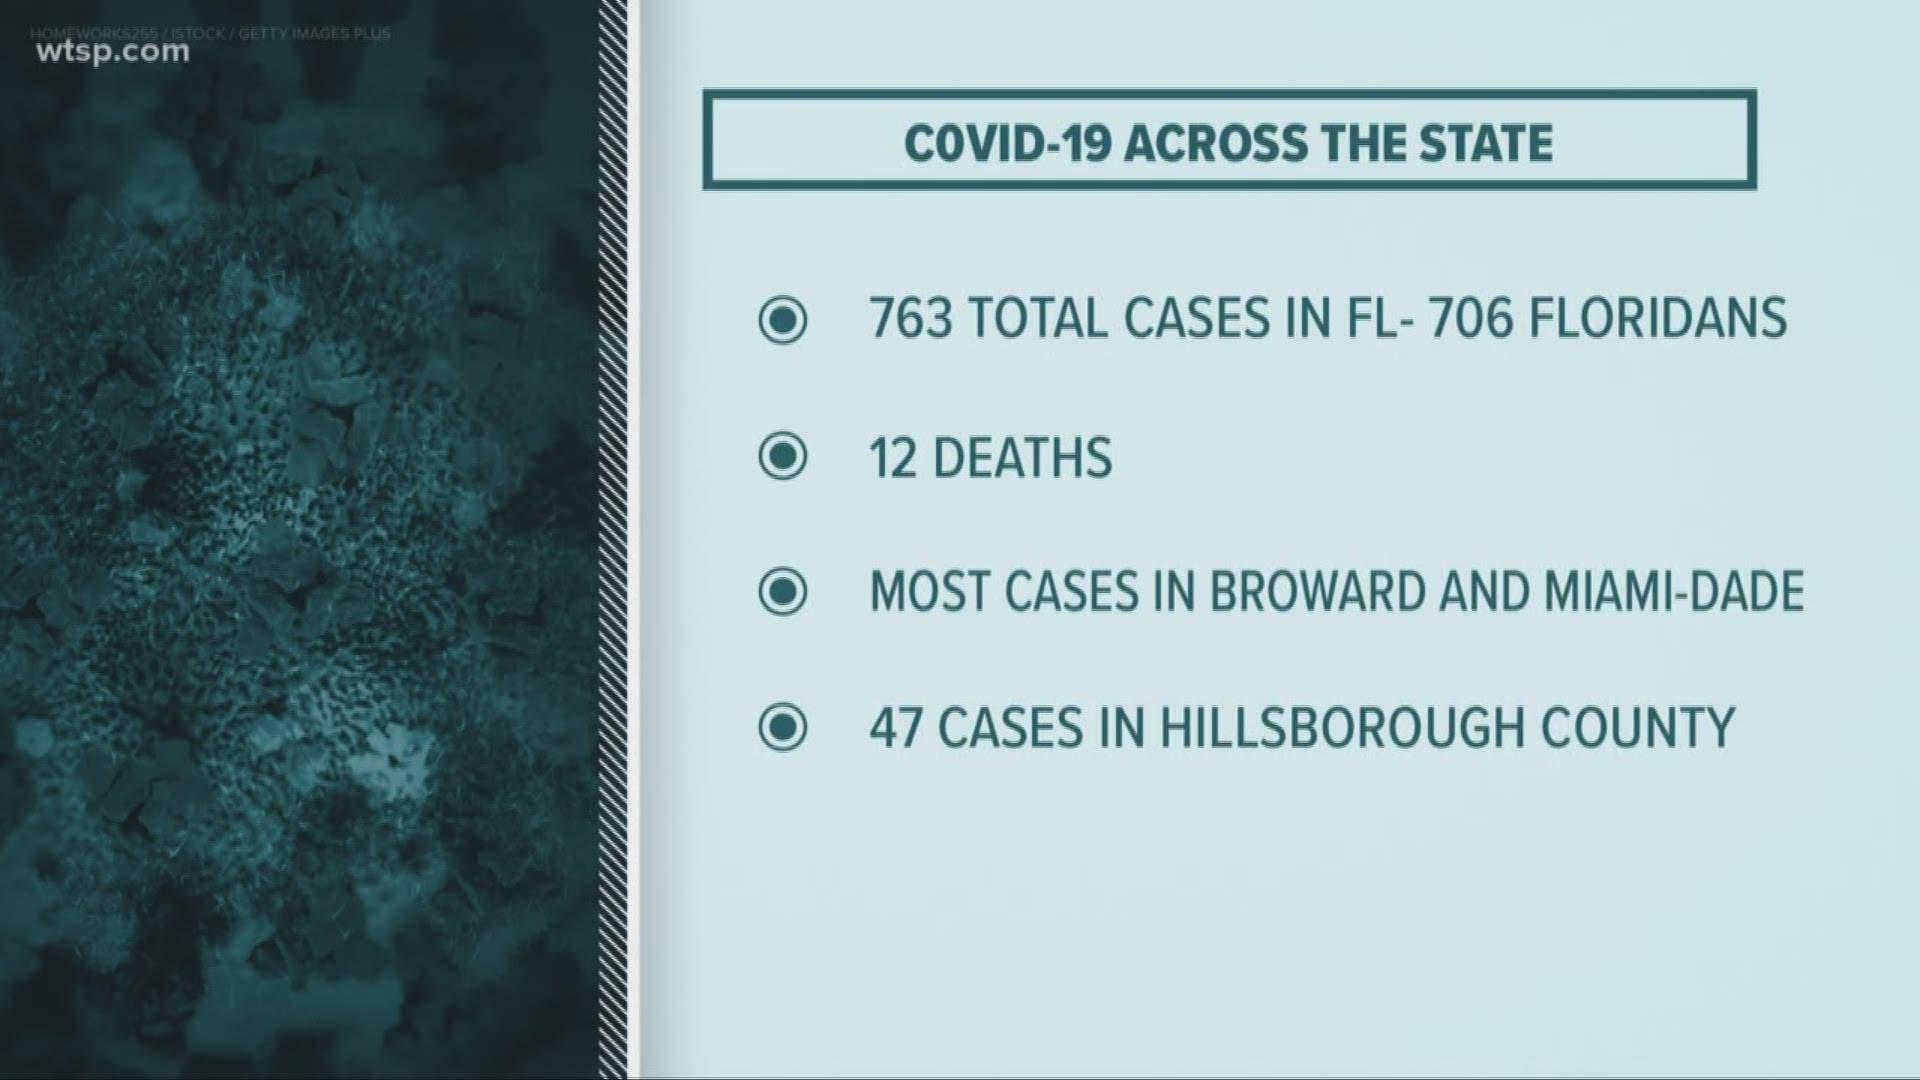 Coronavirus In Florida Latest: Cases Climb To 763, 12 Deaths Throughout Tampa University Spring Break